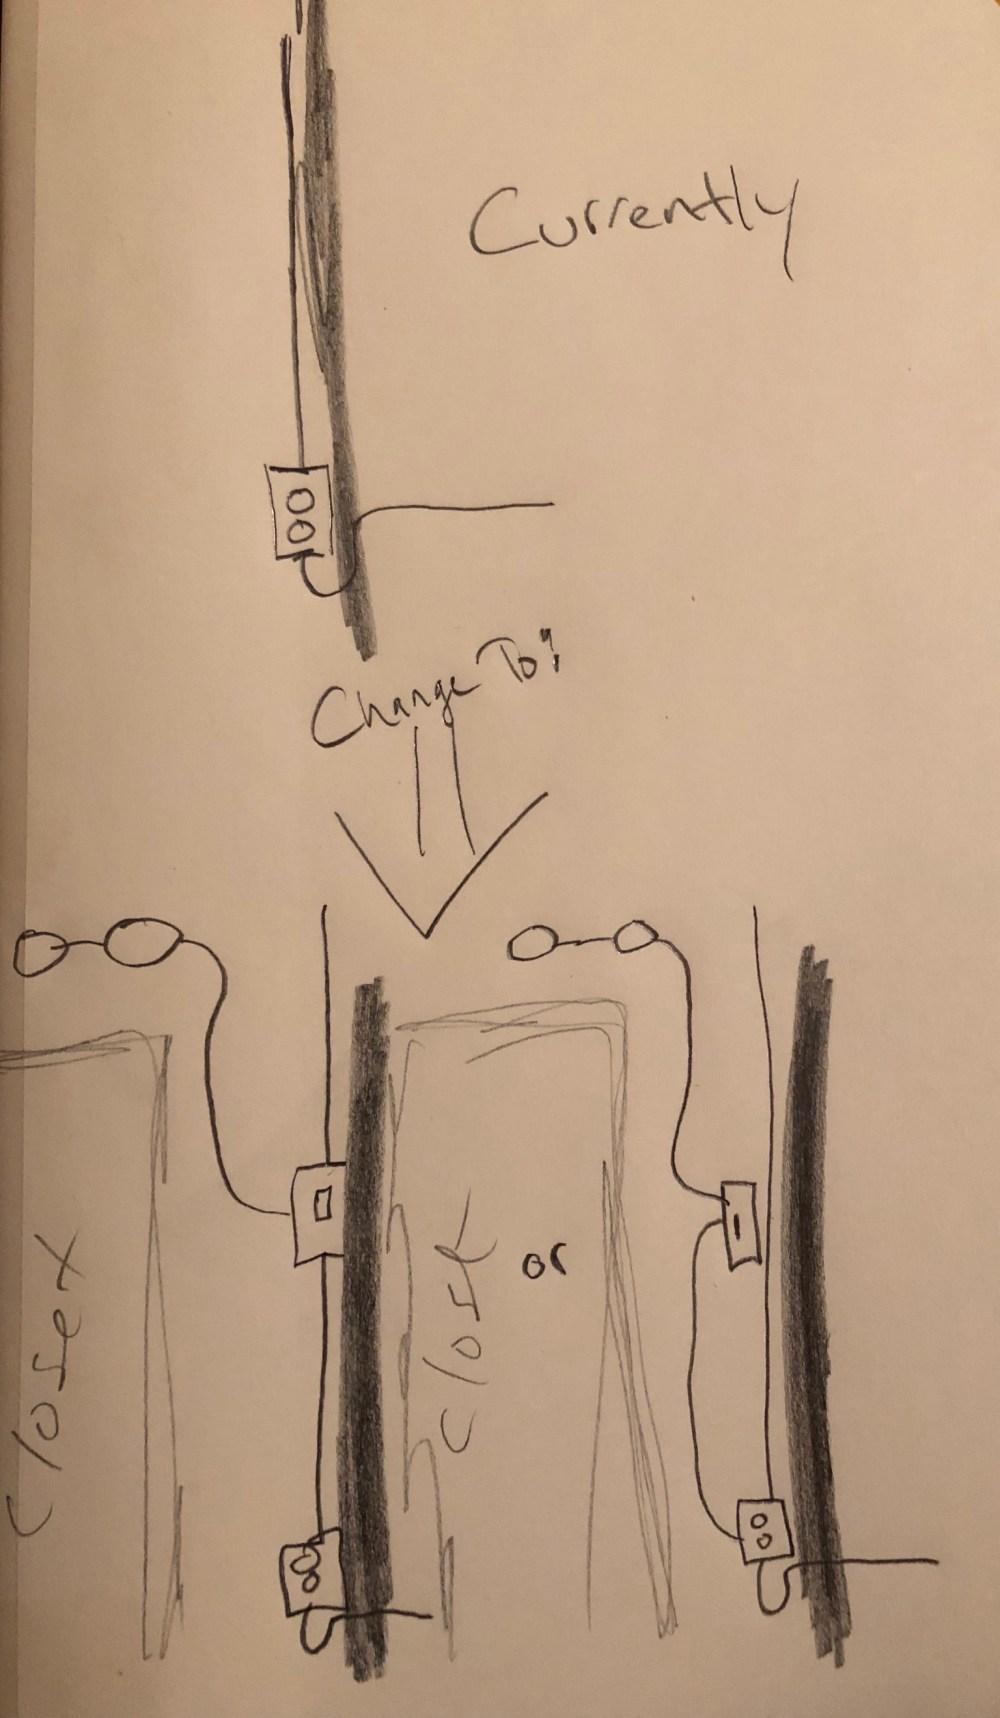 medium resolution of very rough diagram